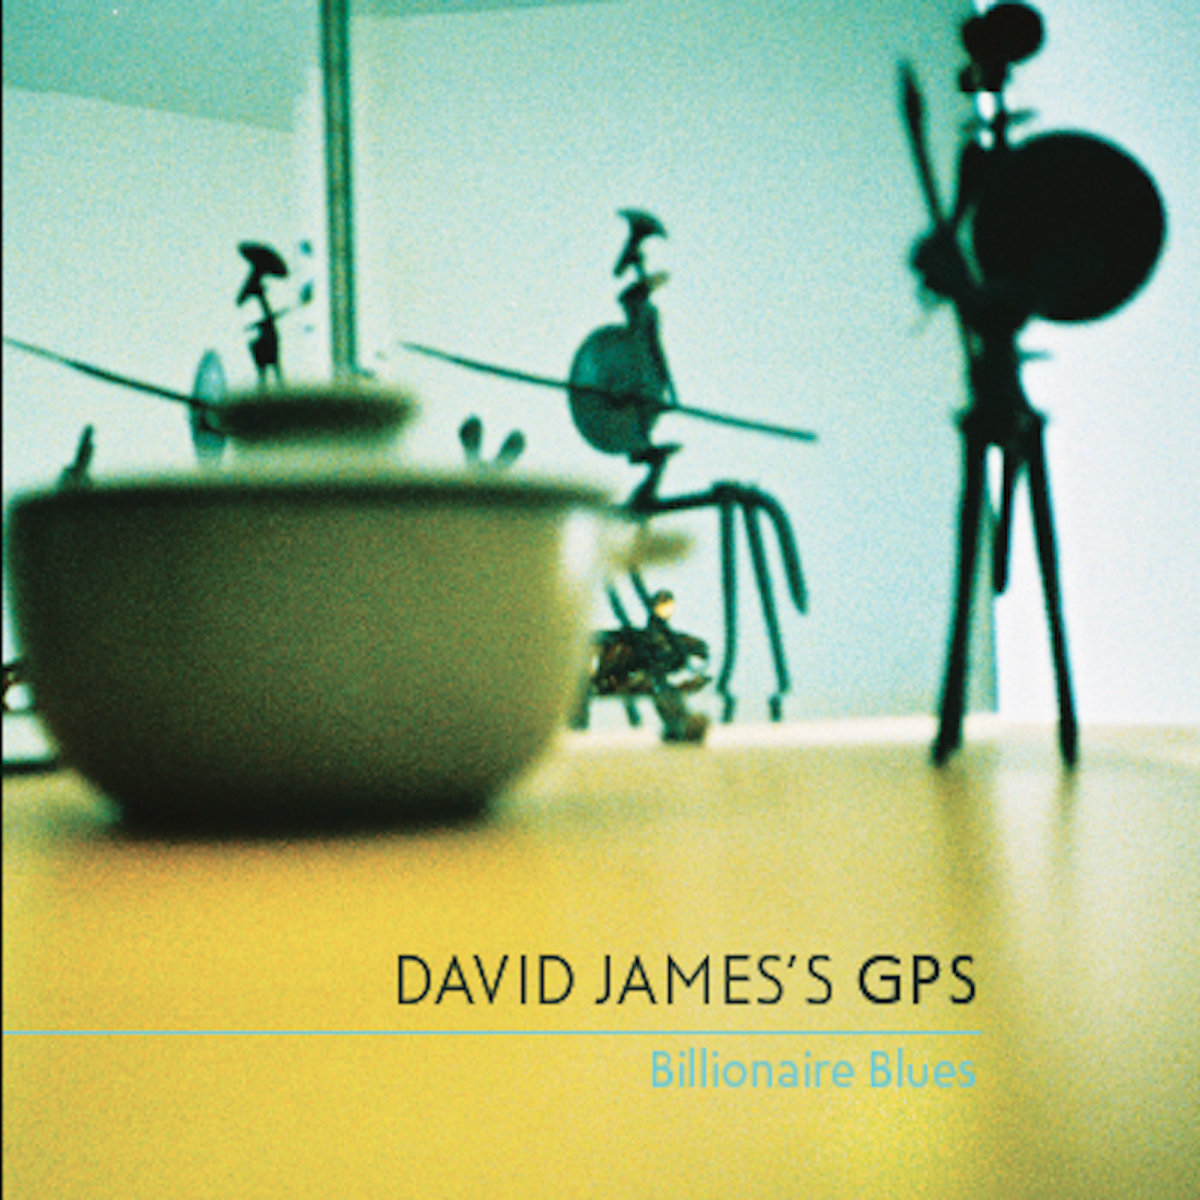 David James Billionaire Blues Memory Select Journeys In Creative